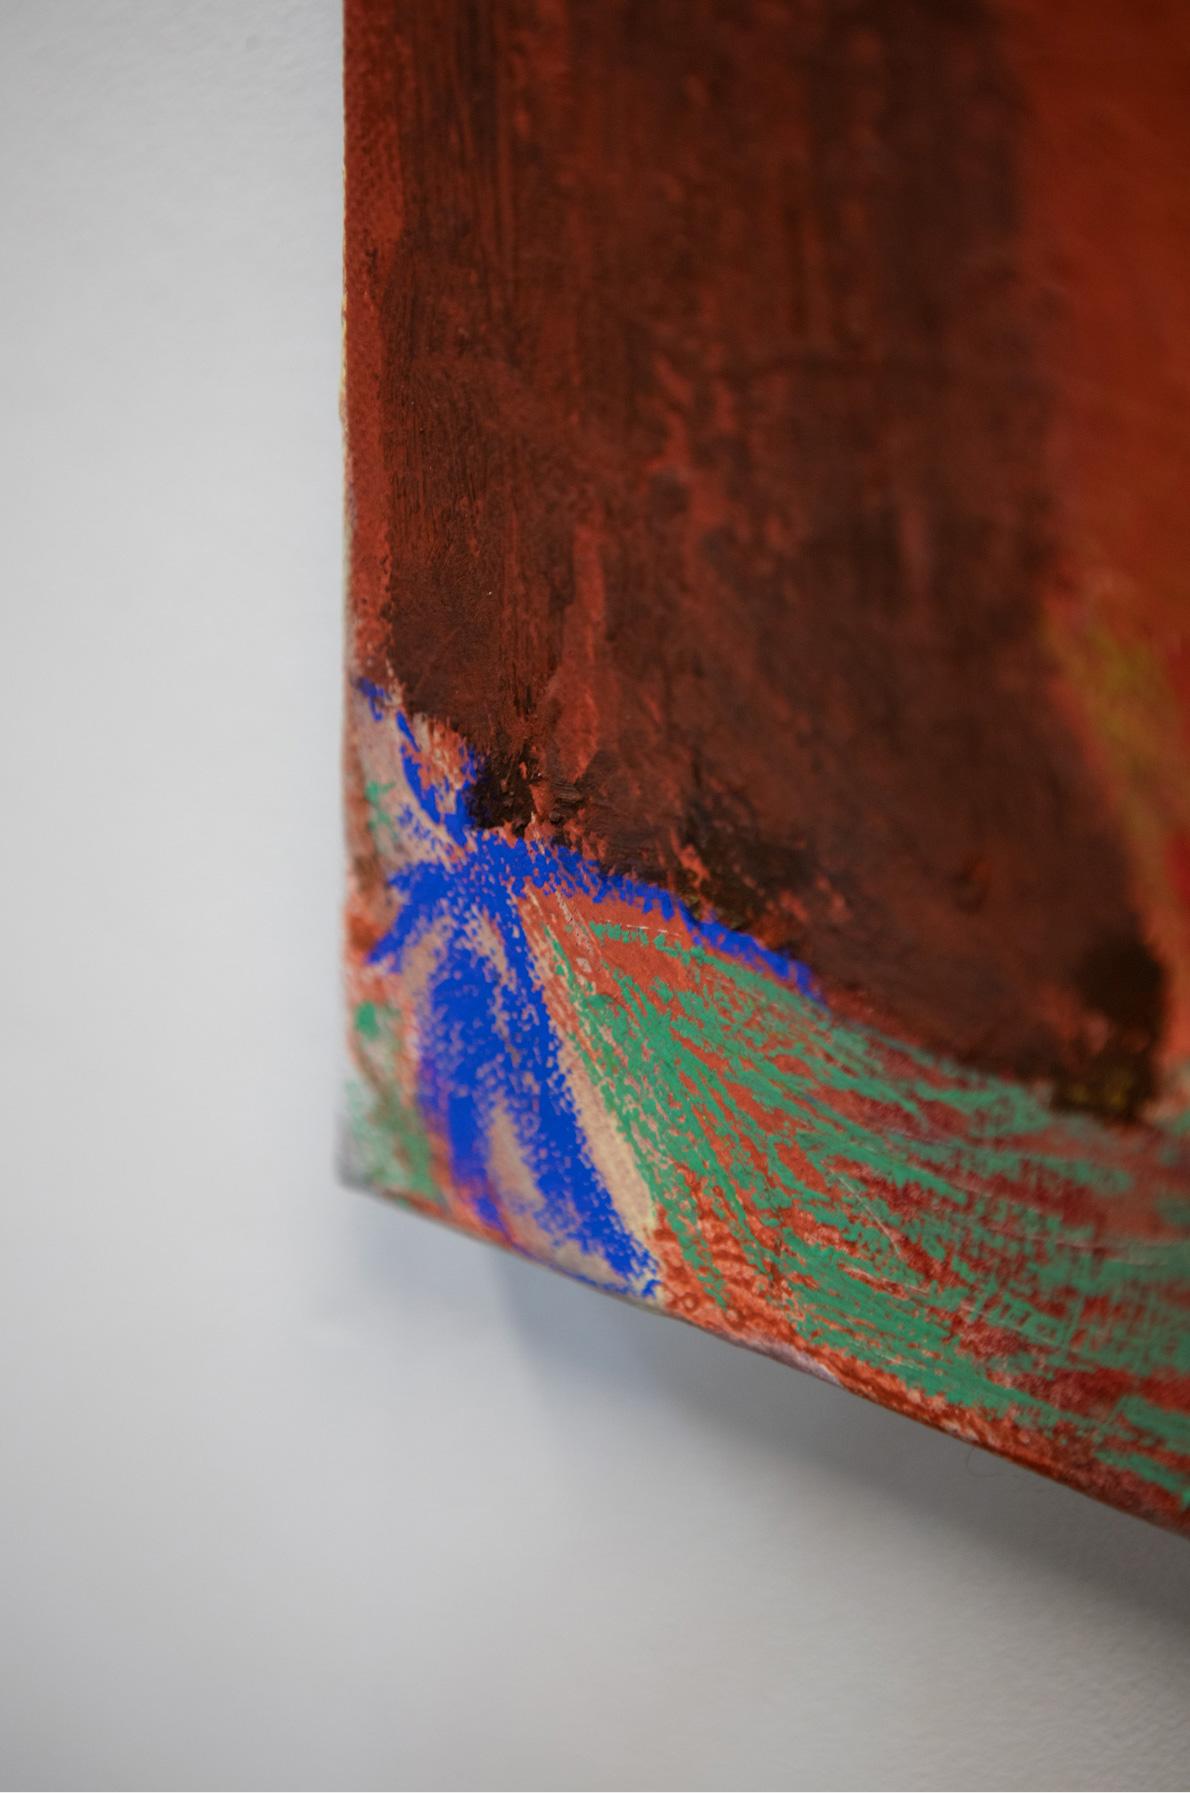 james watkins melania toma painters abstract london0004